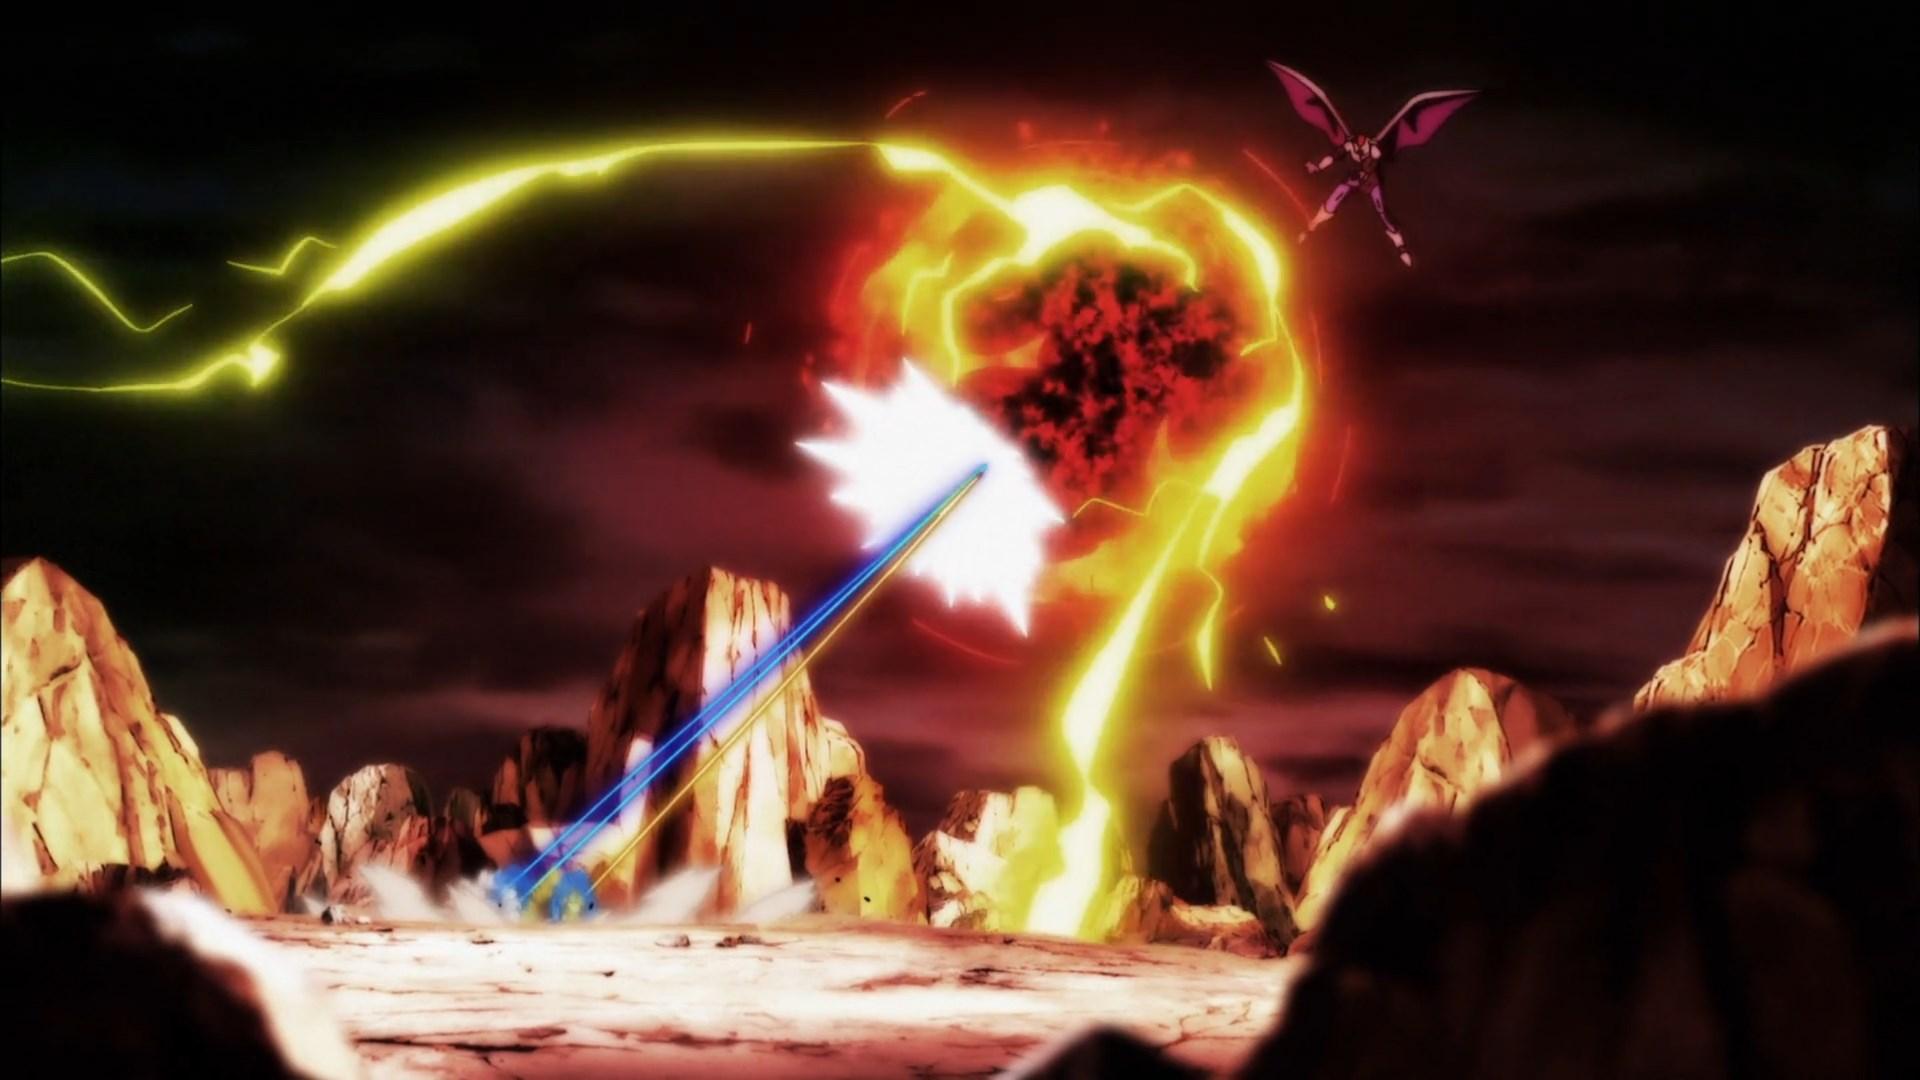 [HorribleSubs] Dragon Ball Super - 121 [1080p].mkv_snapshot_19.27